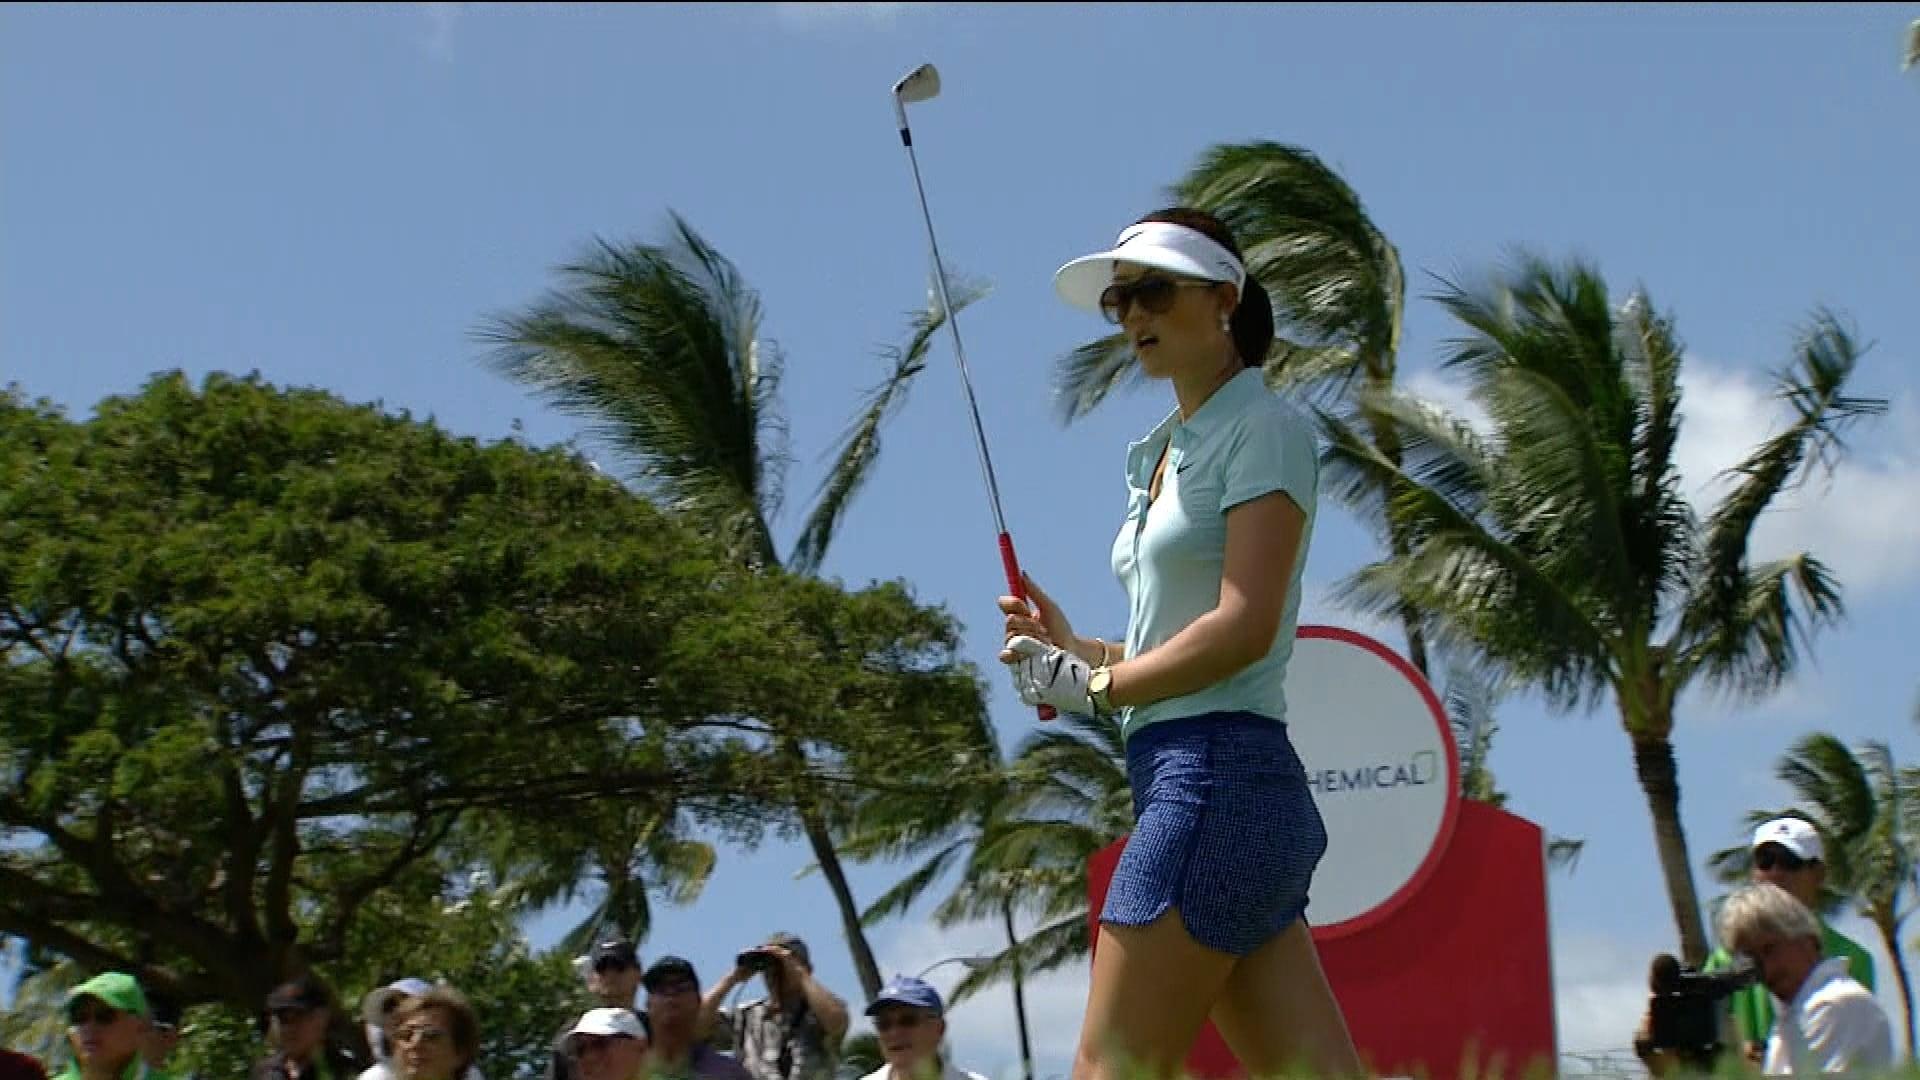 Lisa Cornwell Golf Channel